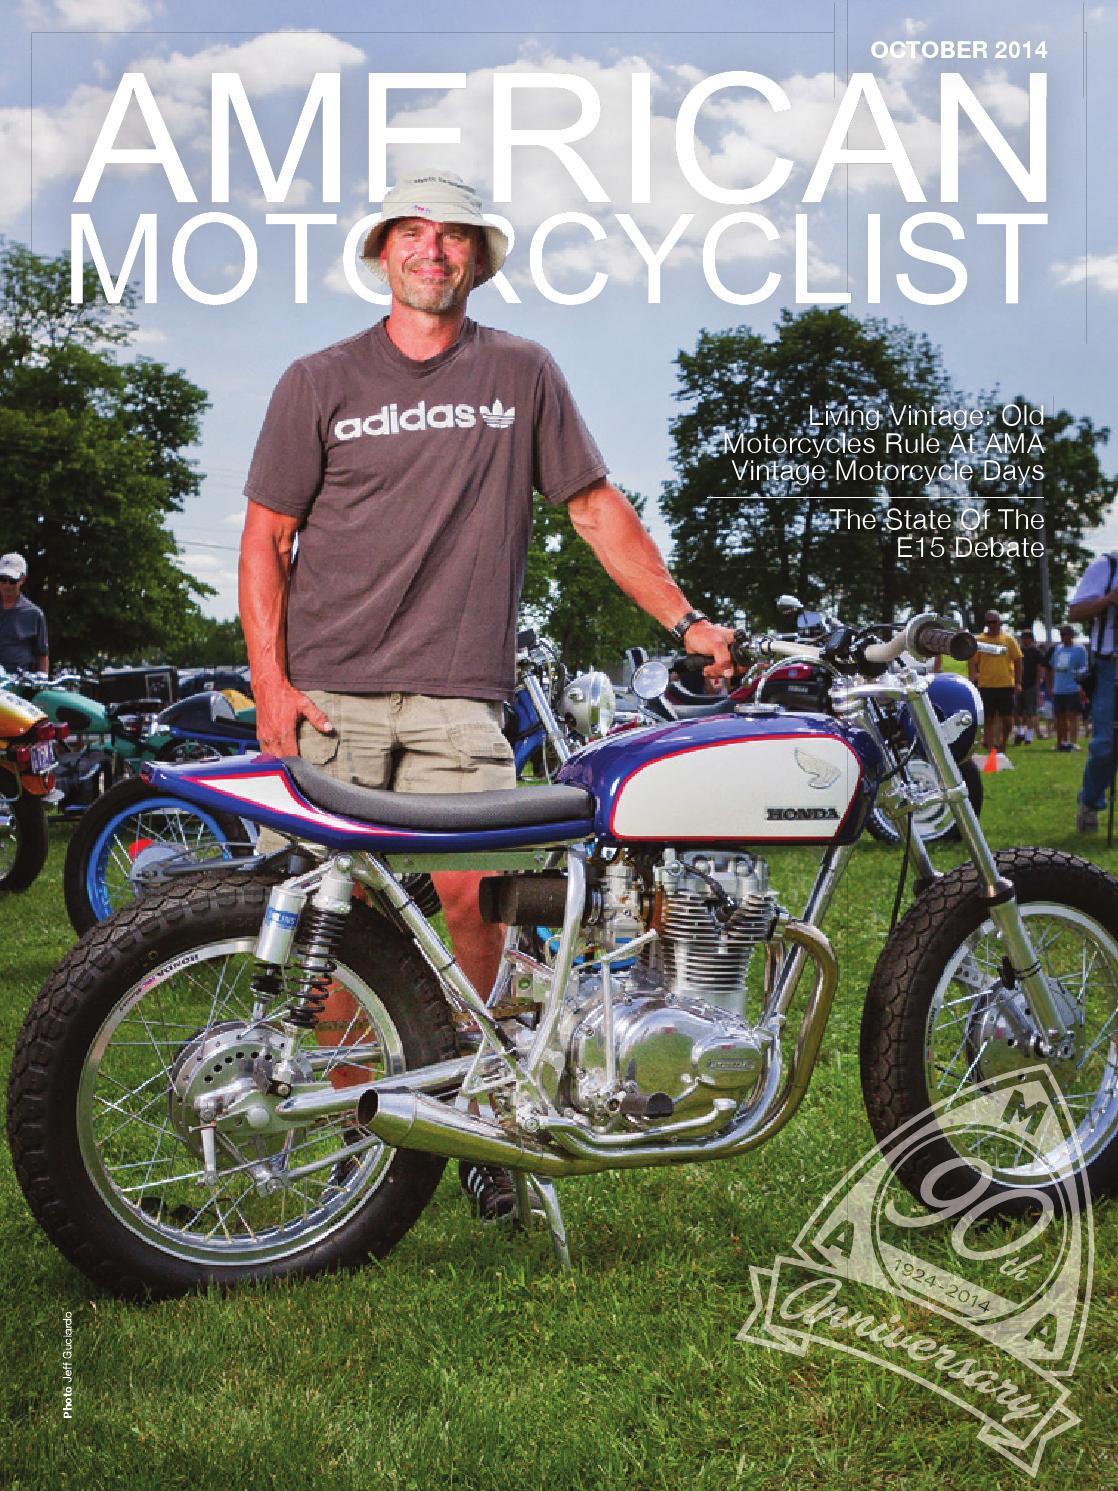 Powertye Front Lowering Strap Drag Pull Frontend Motorcycle Sportbike Suzuki